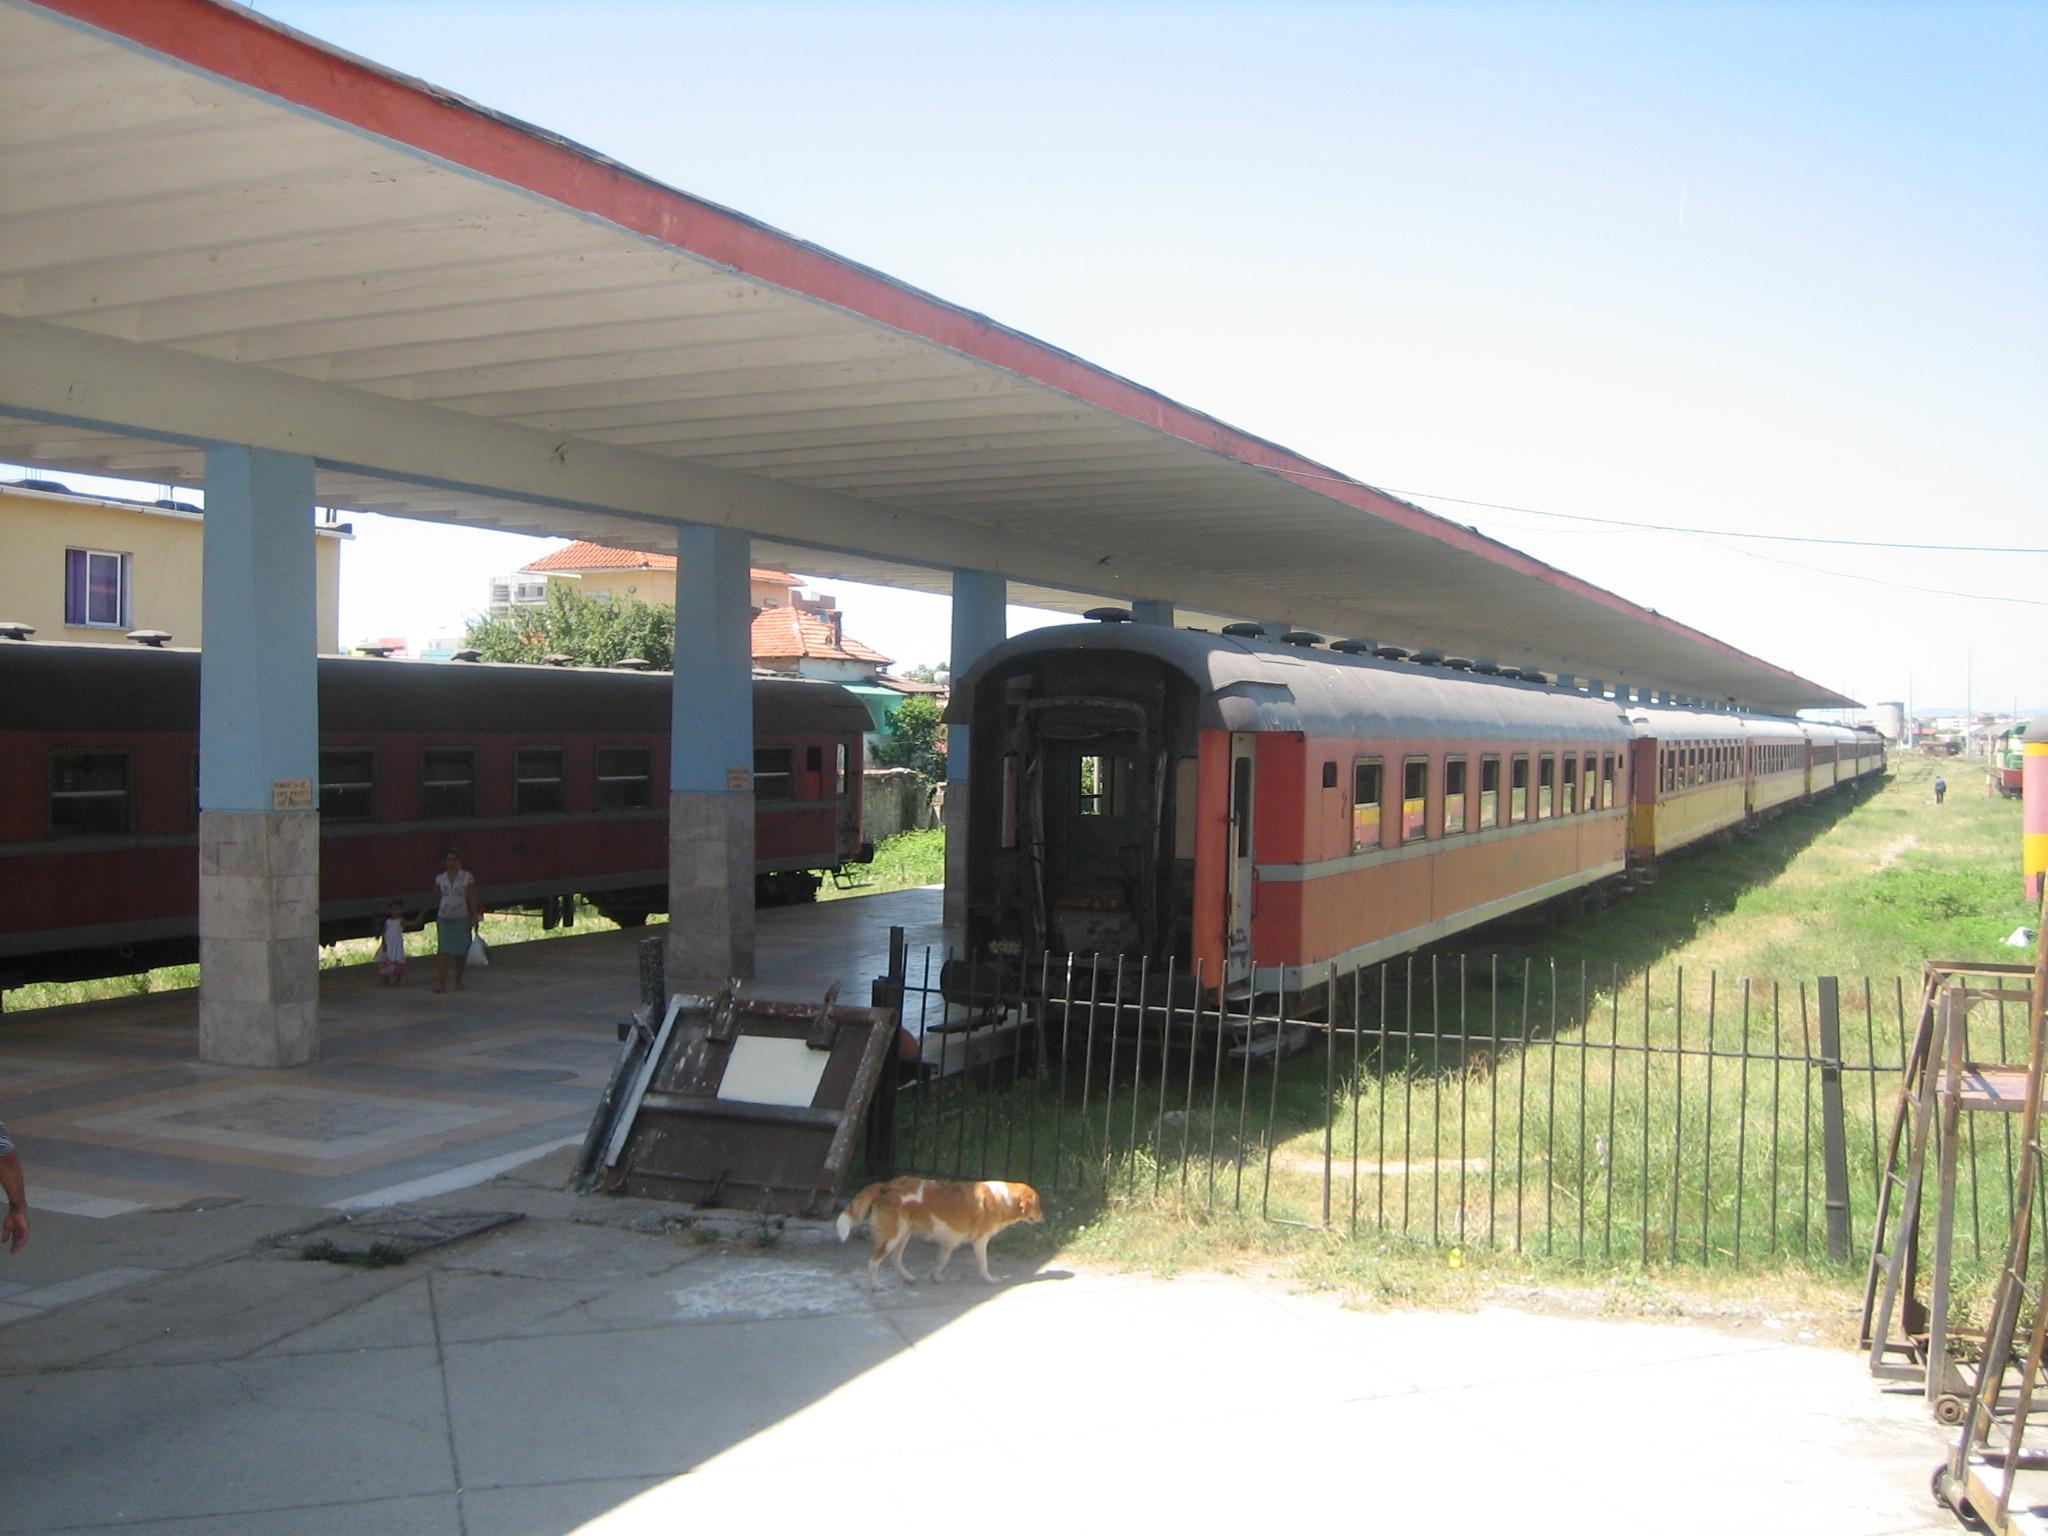 Tirana railway station - Wikipedia